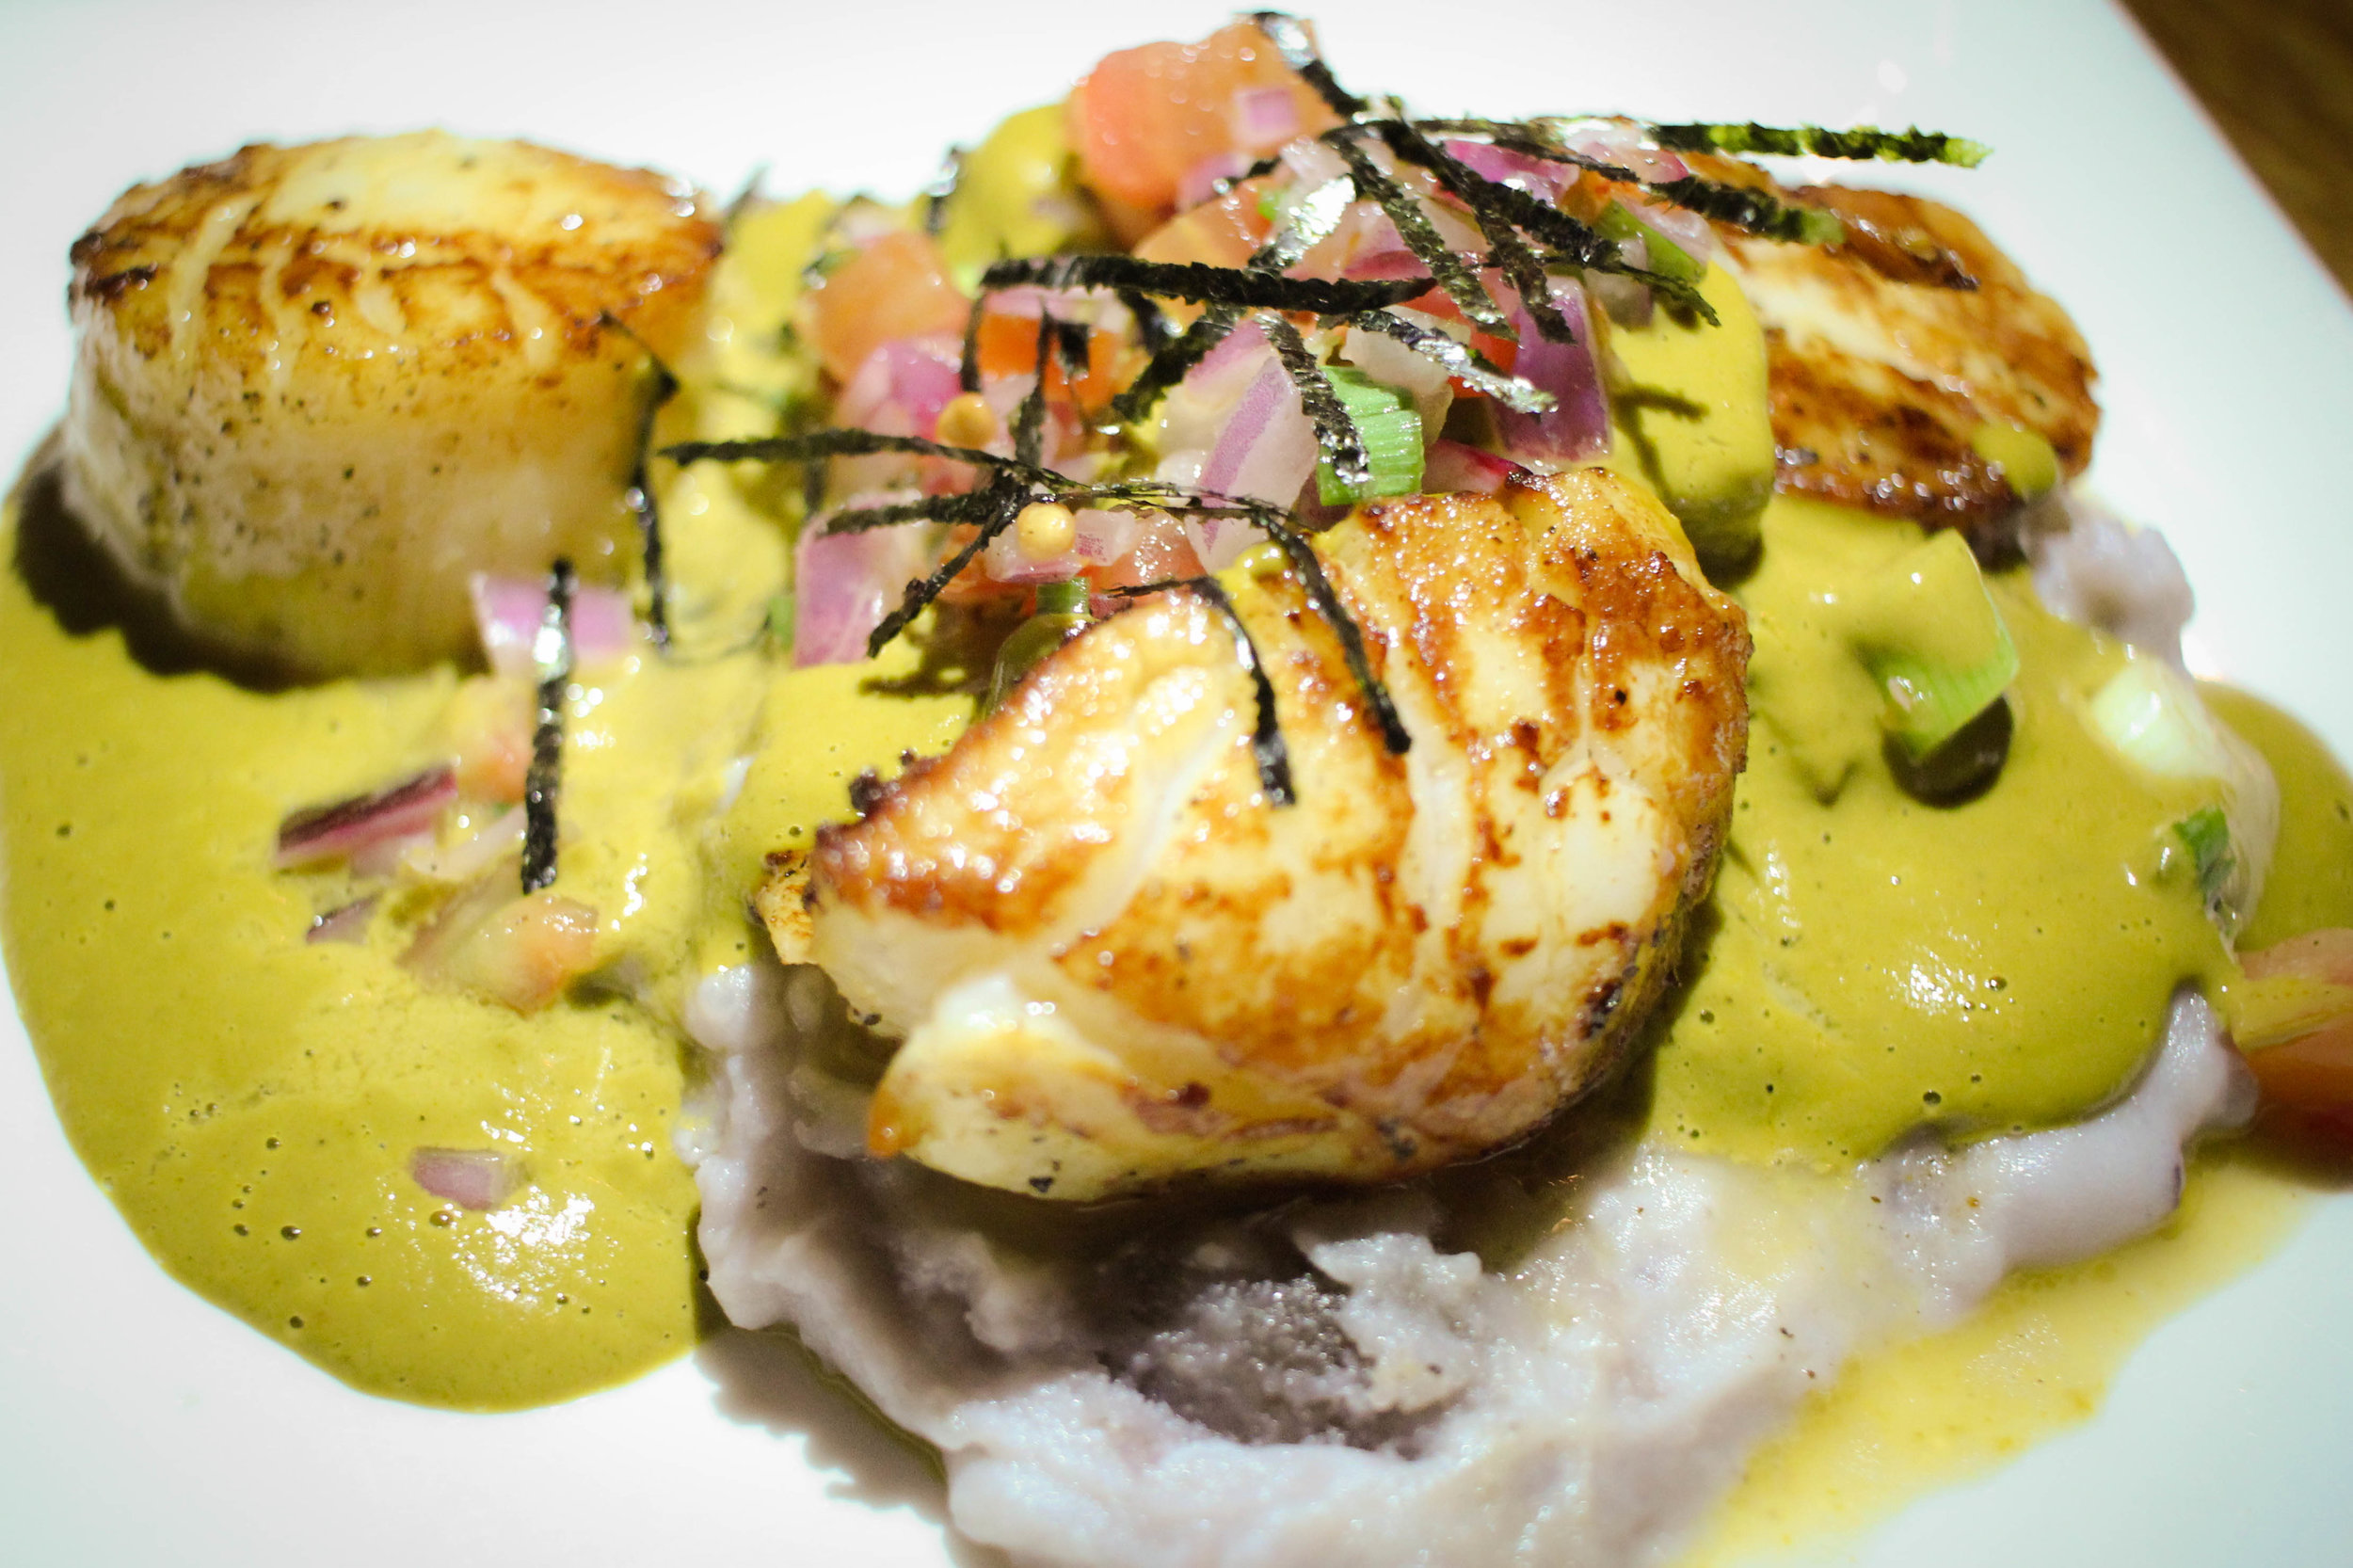 Scallops Fisho: Day boat scallops pan seared with blue mashed potatoes, sarsa panchita.